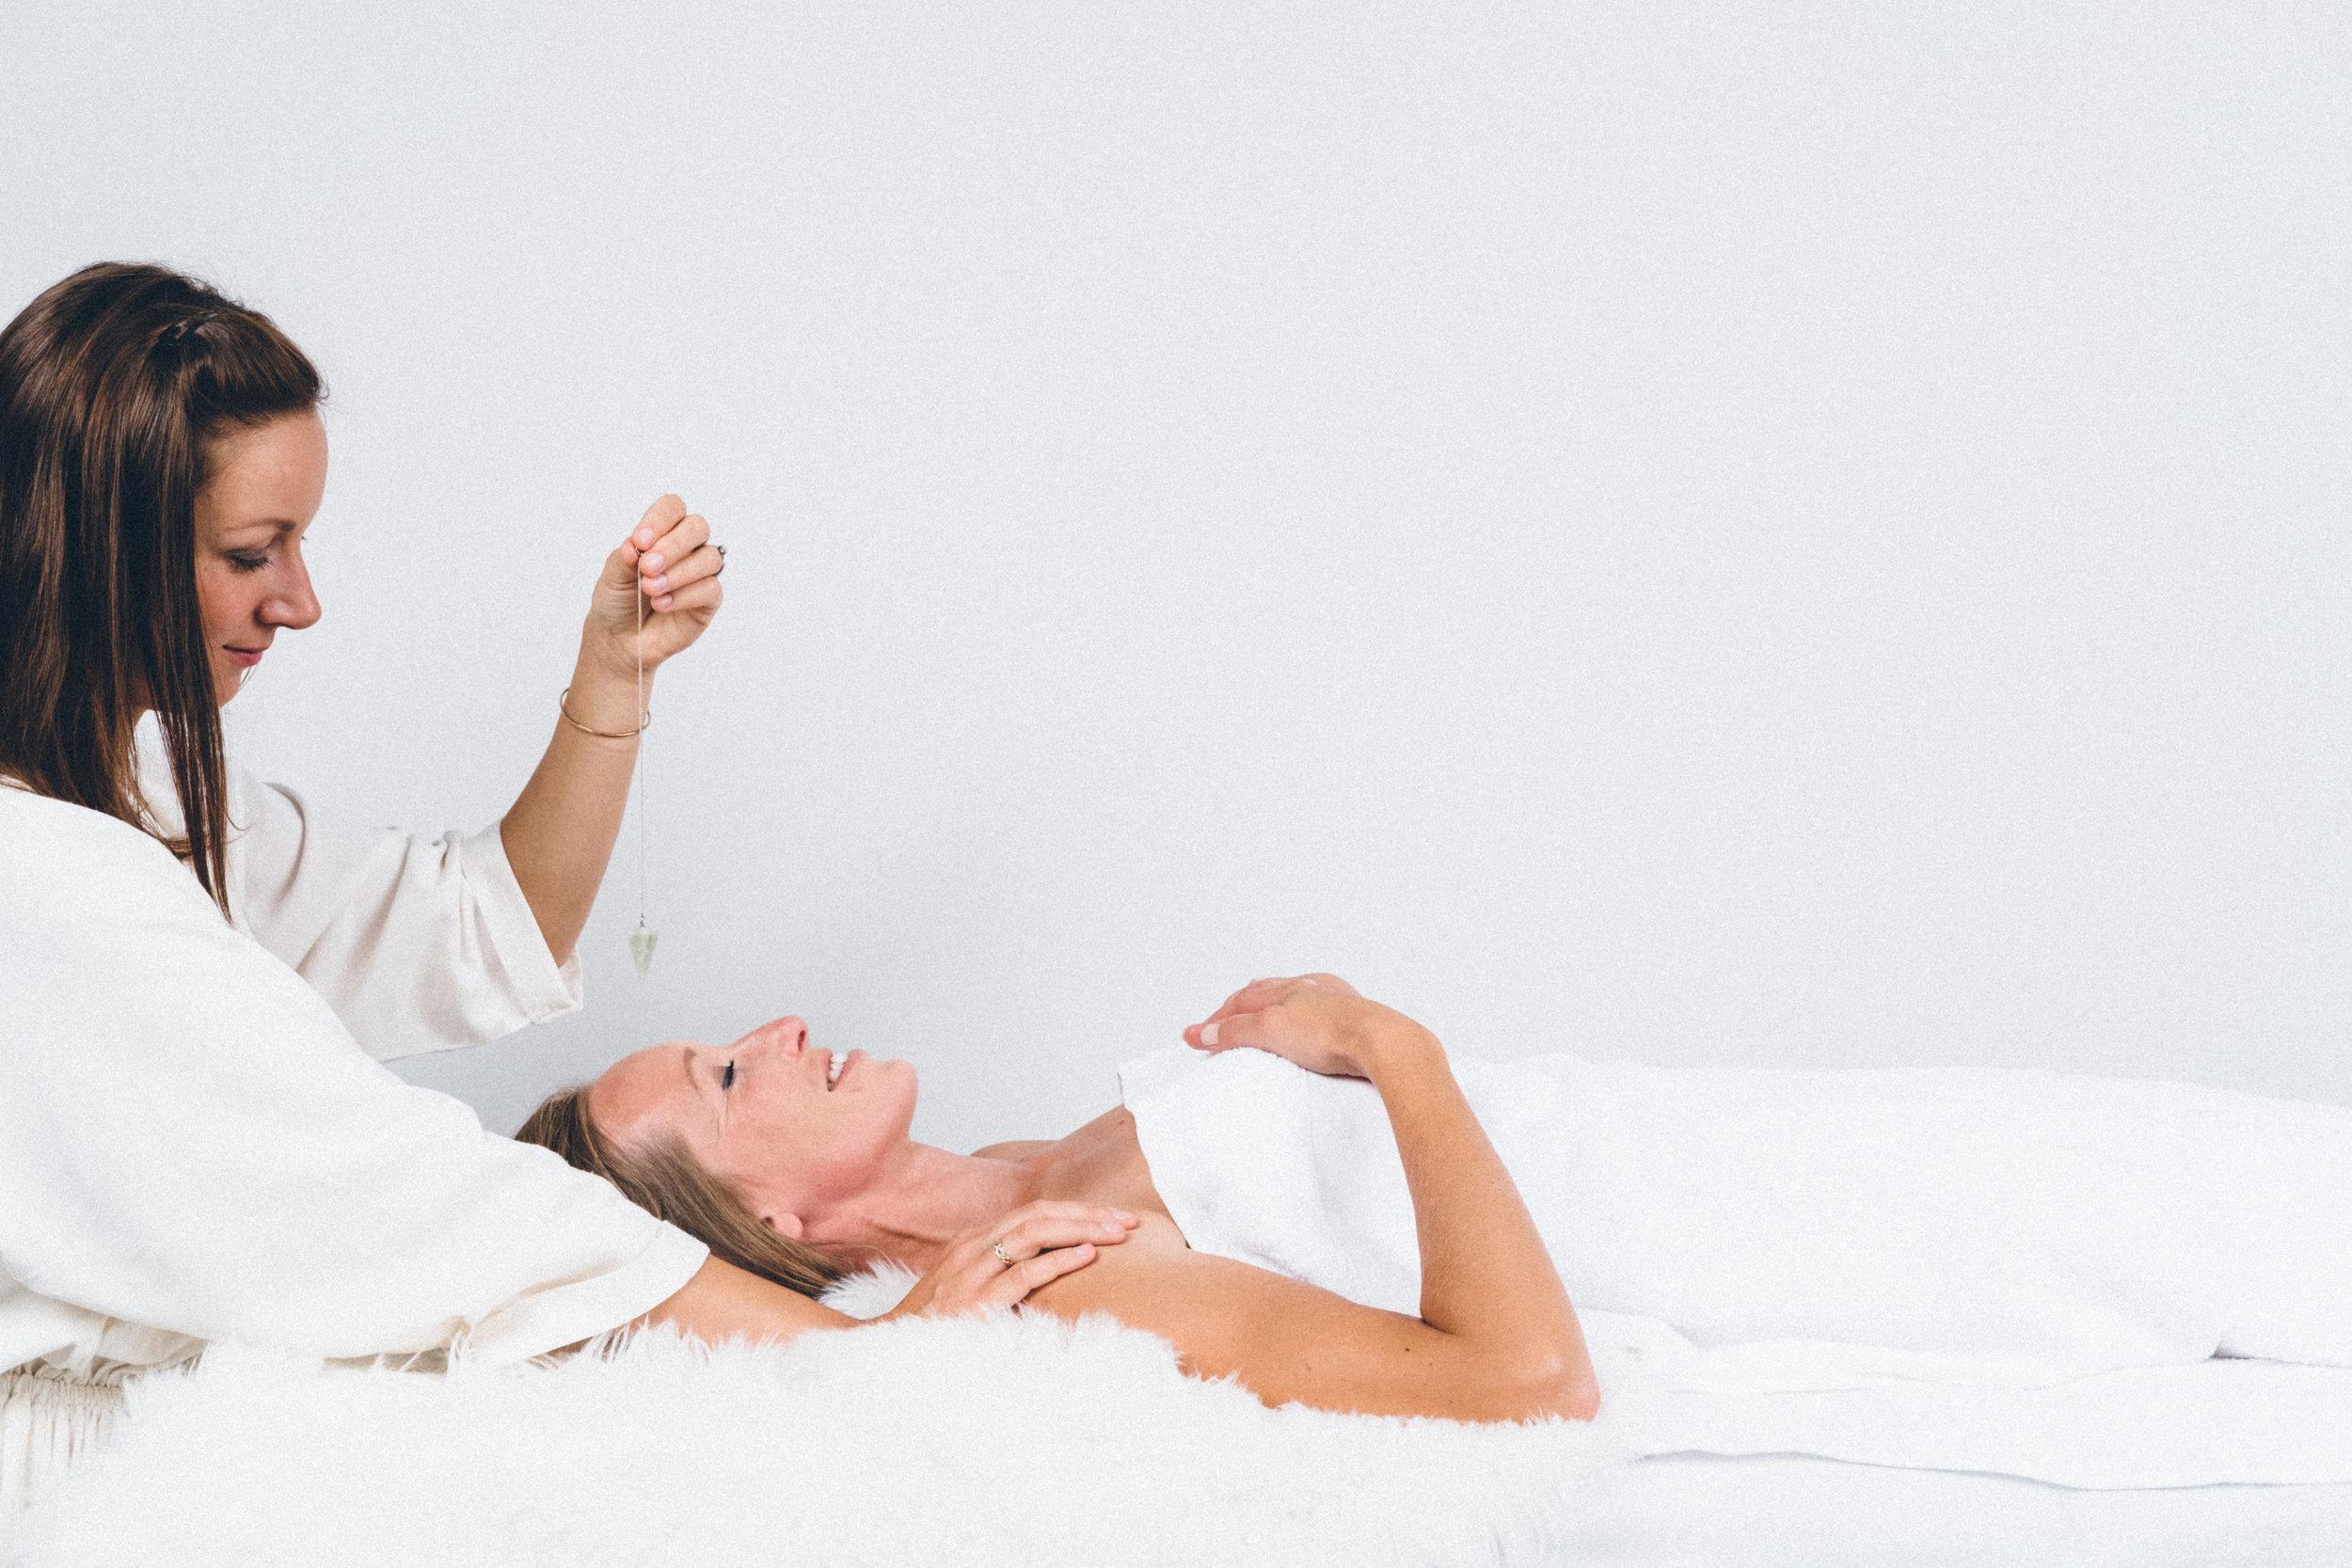 FULL BODY MASSAGE WITH HEALING BODY WORK -